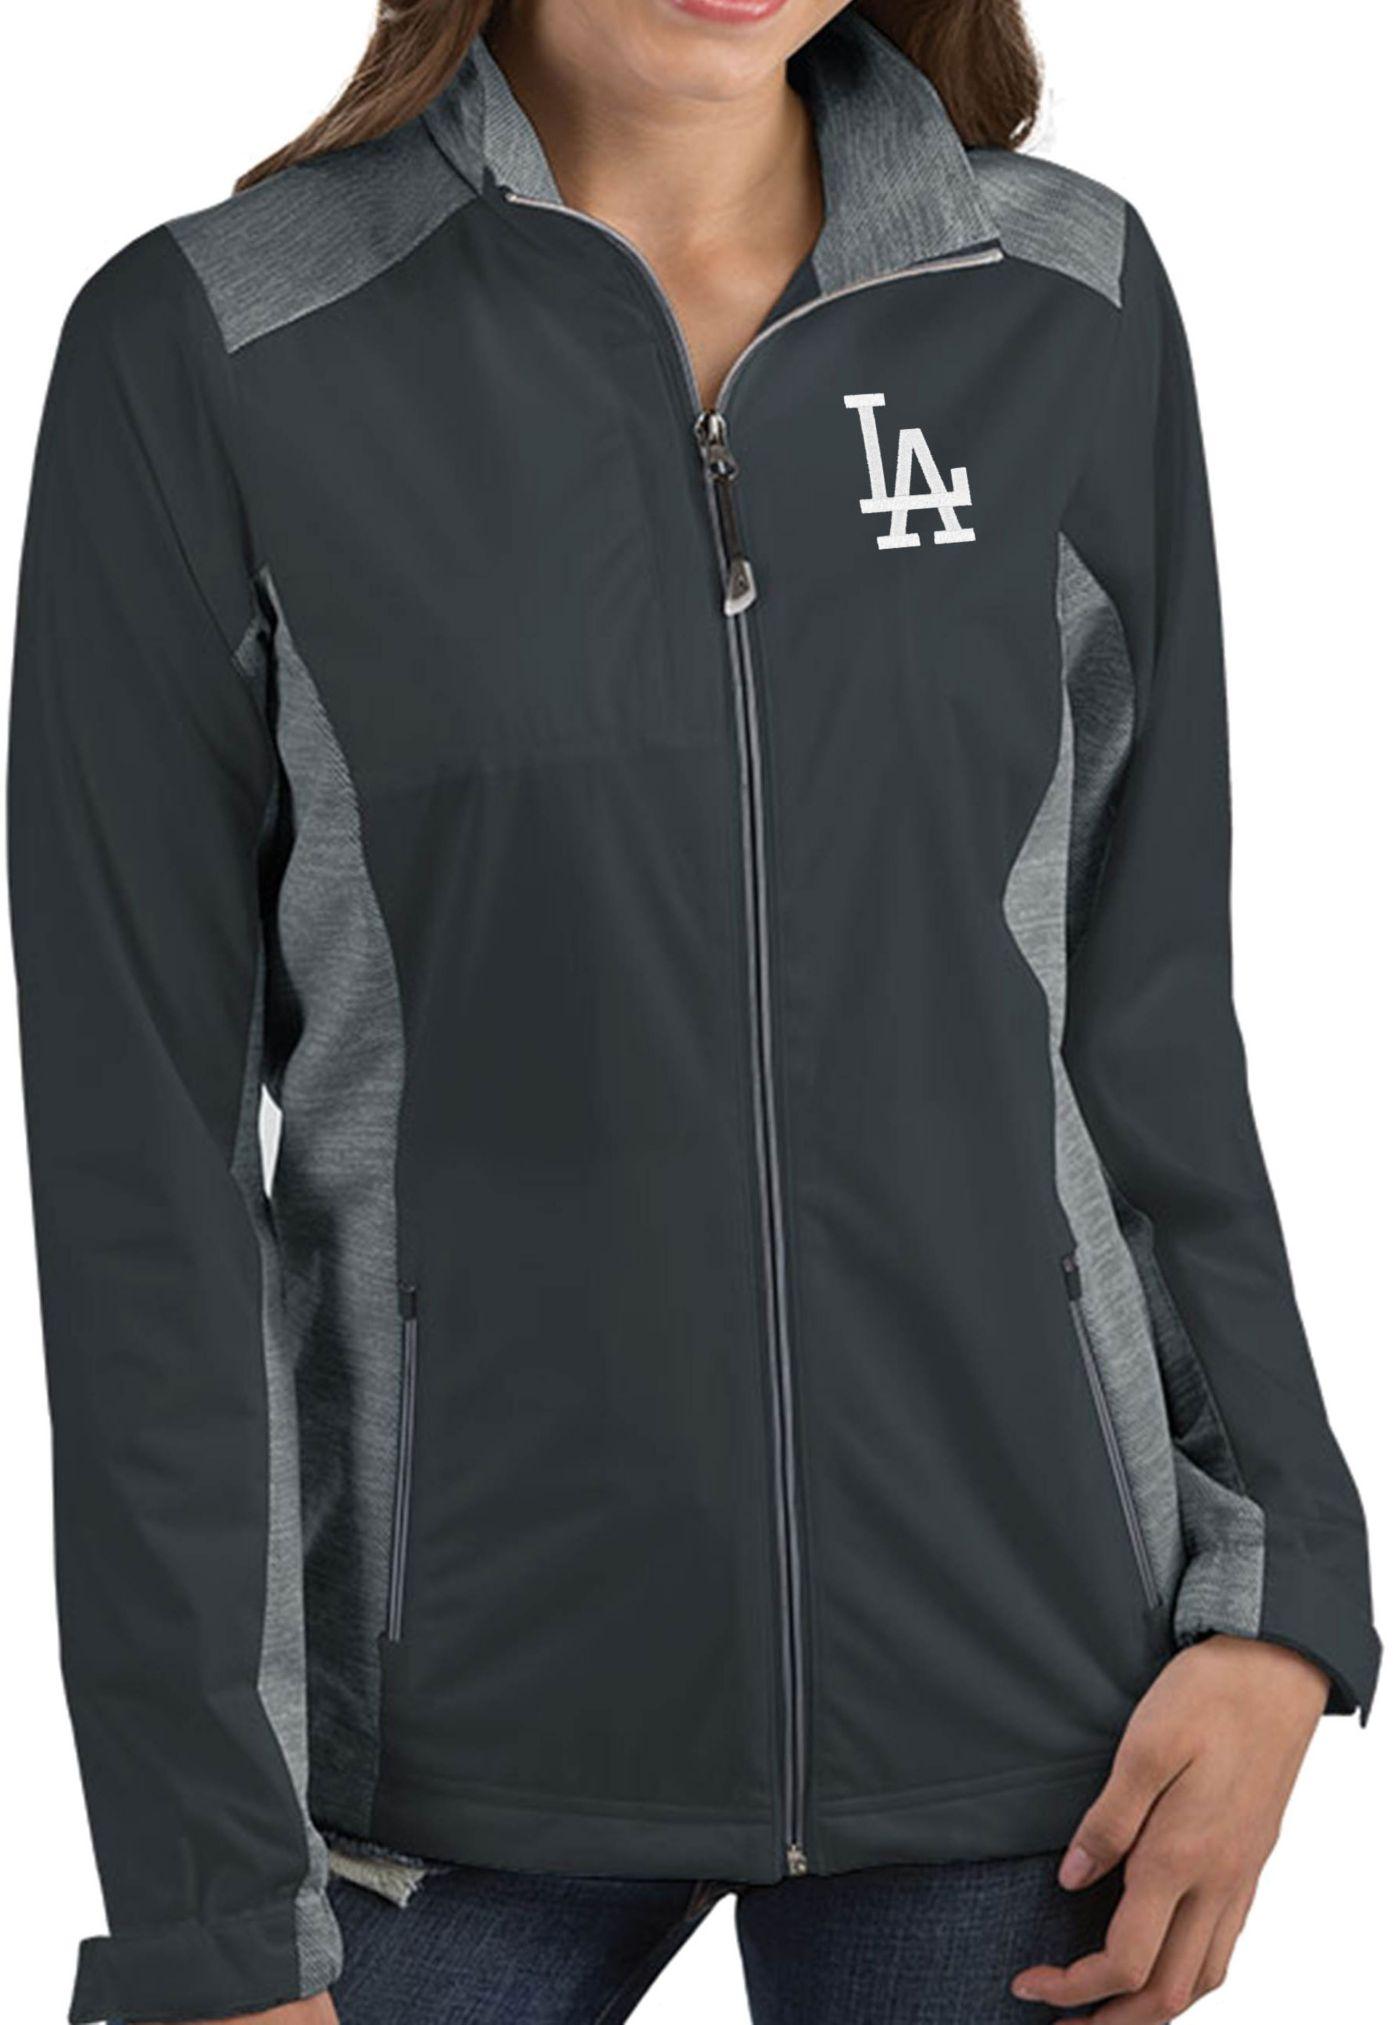 Antigua Women's Los Angeles Dodgers Revolve Grey Full-Zip Jacket